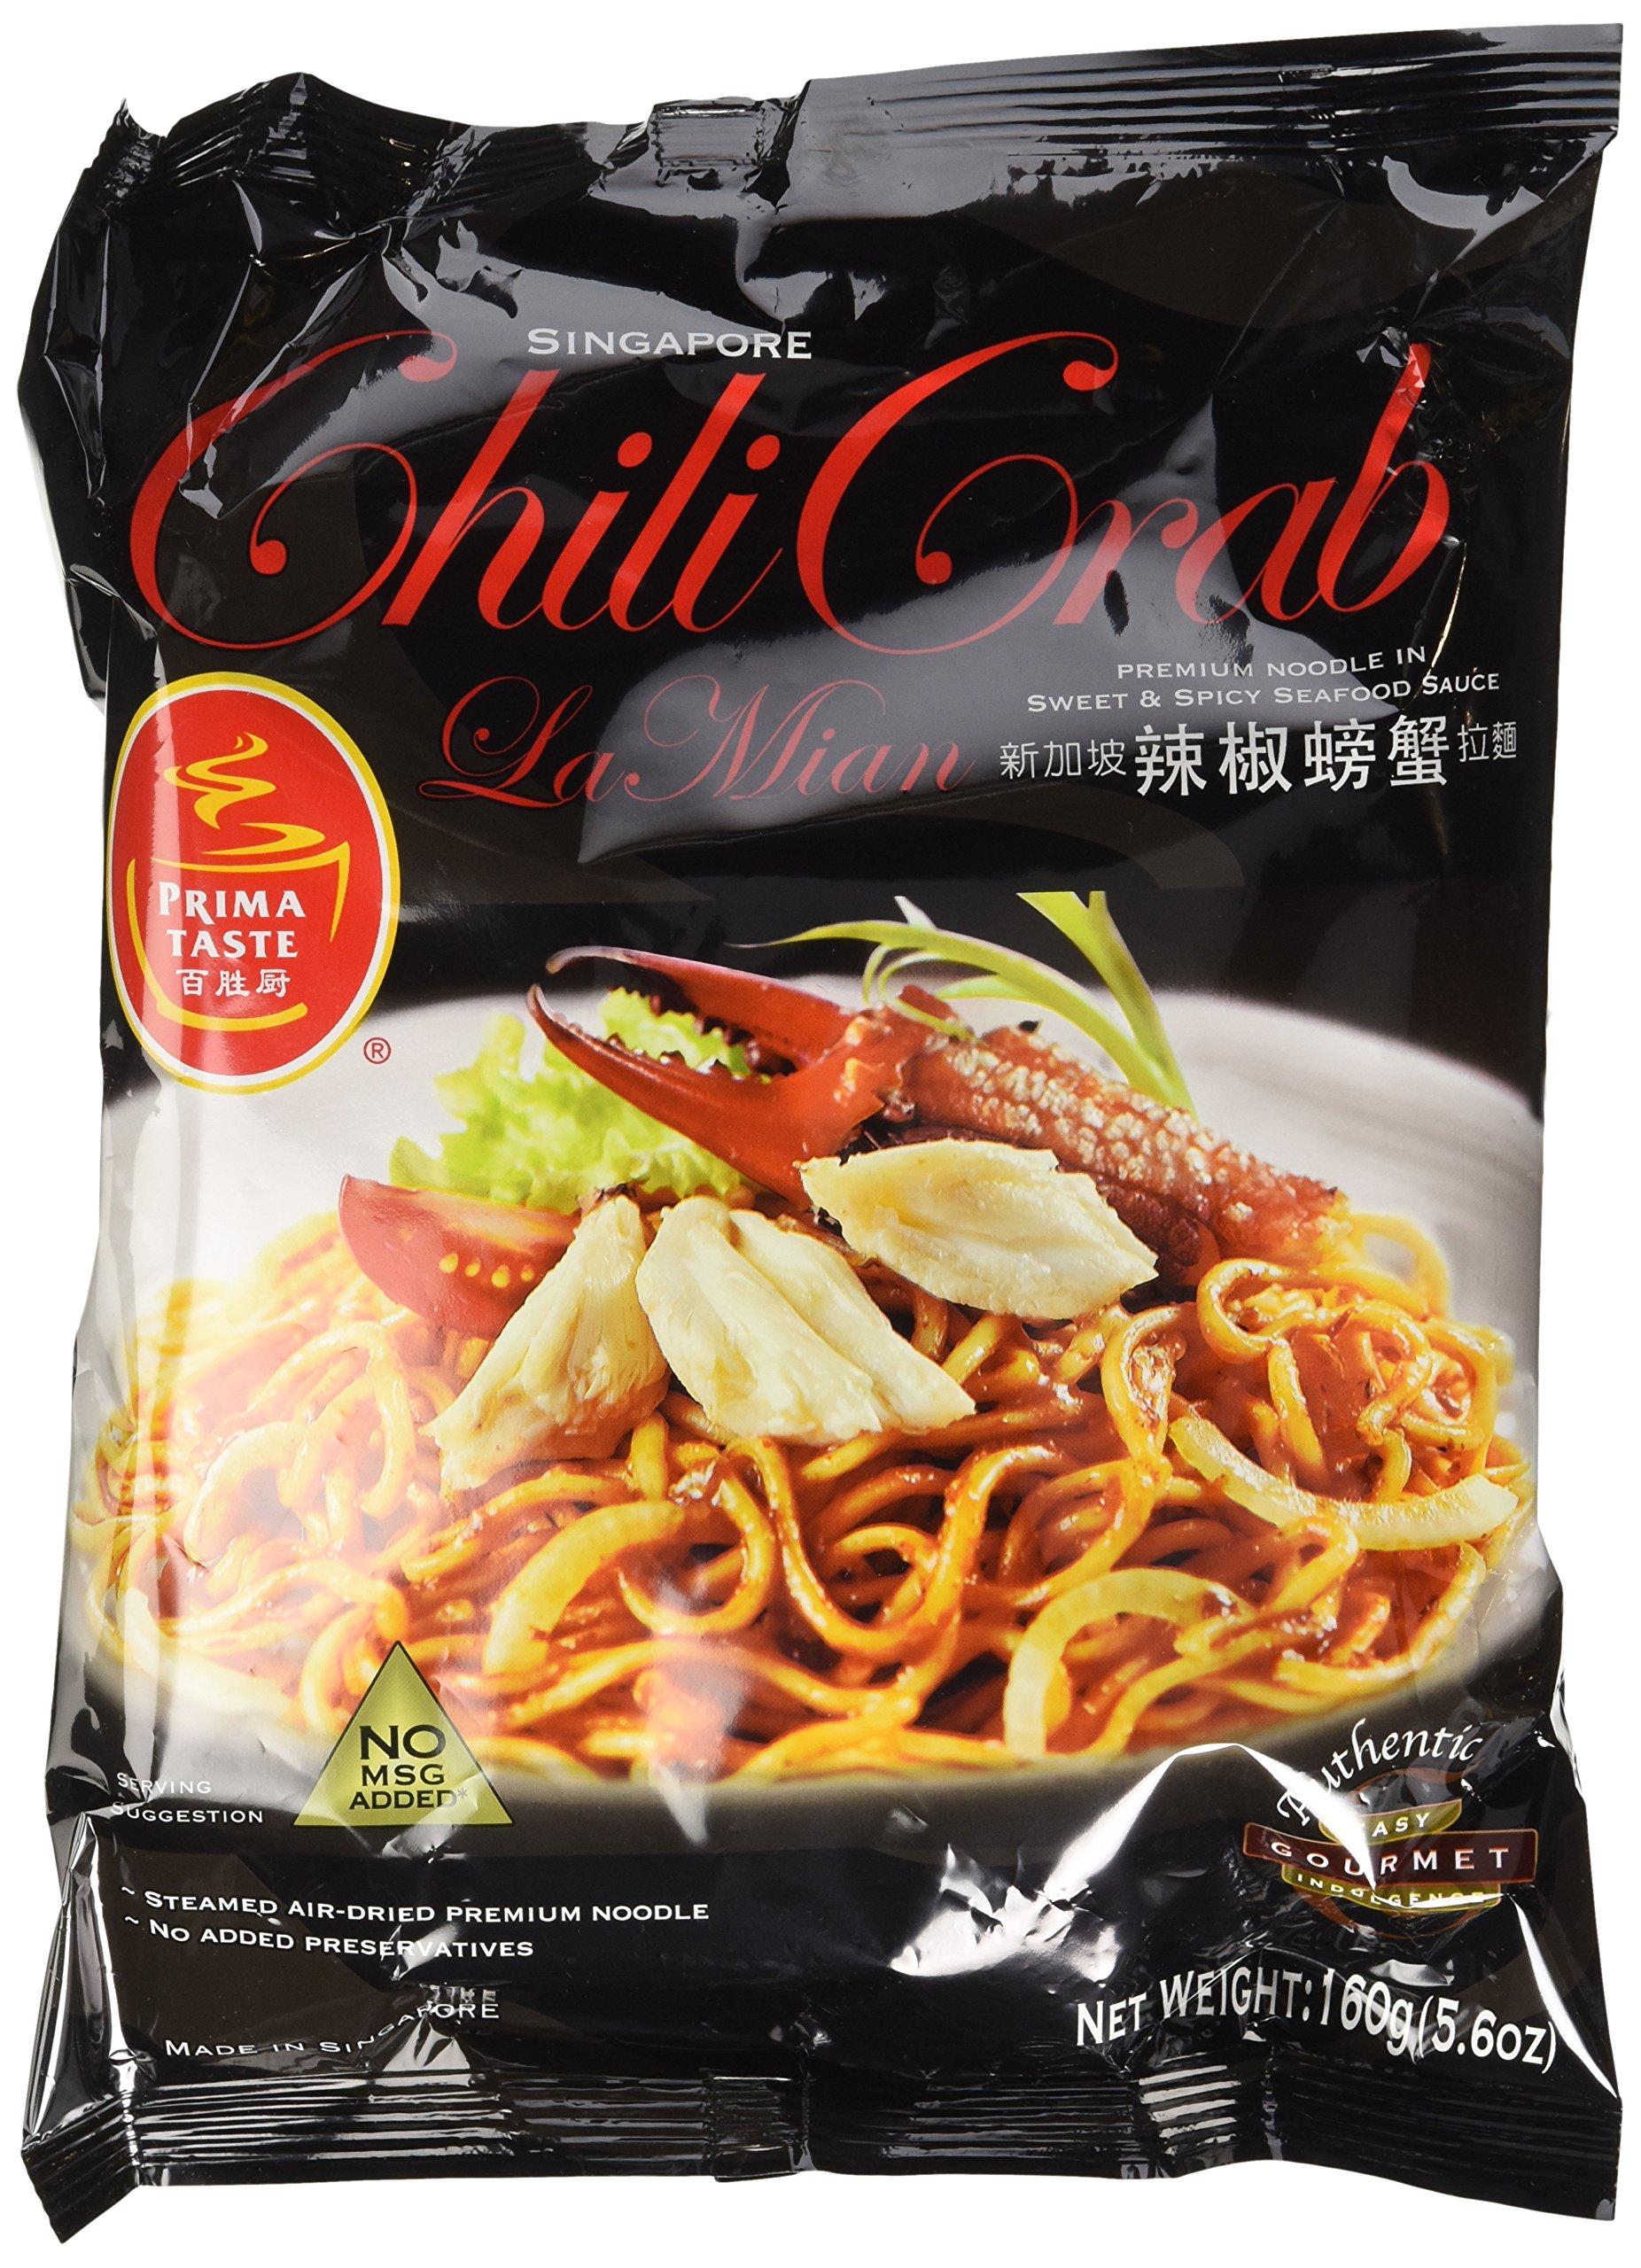 Prima Taste Singapore Chilli Crab Lamian Noodles, Pack of 12